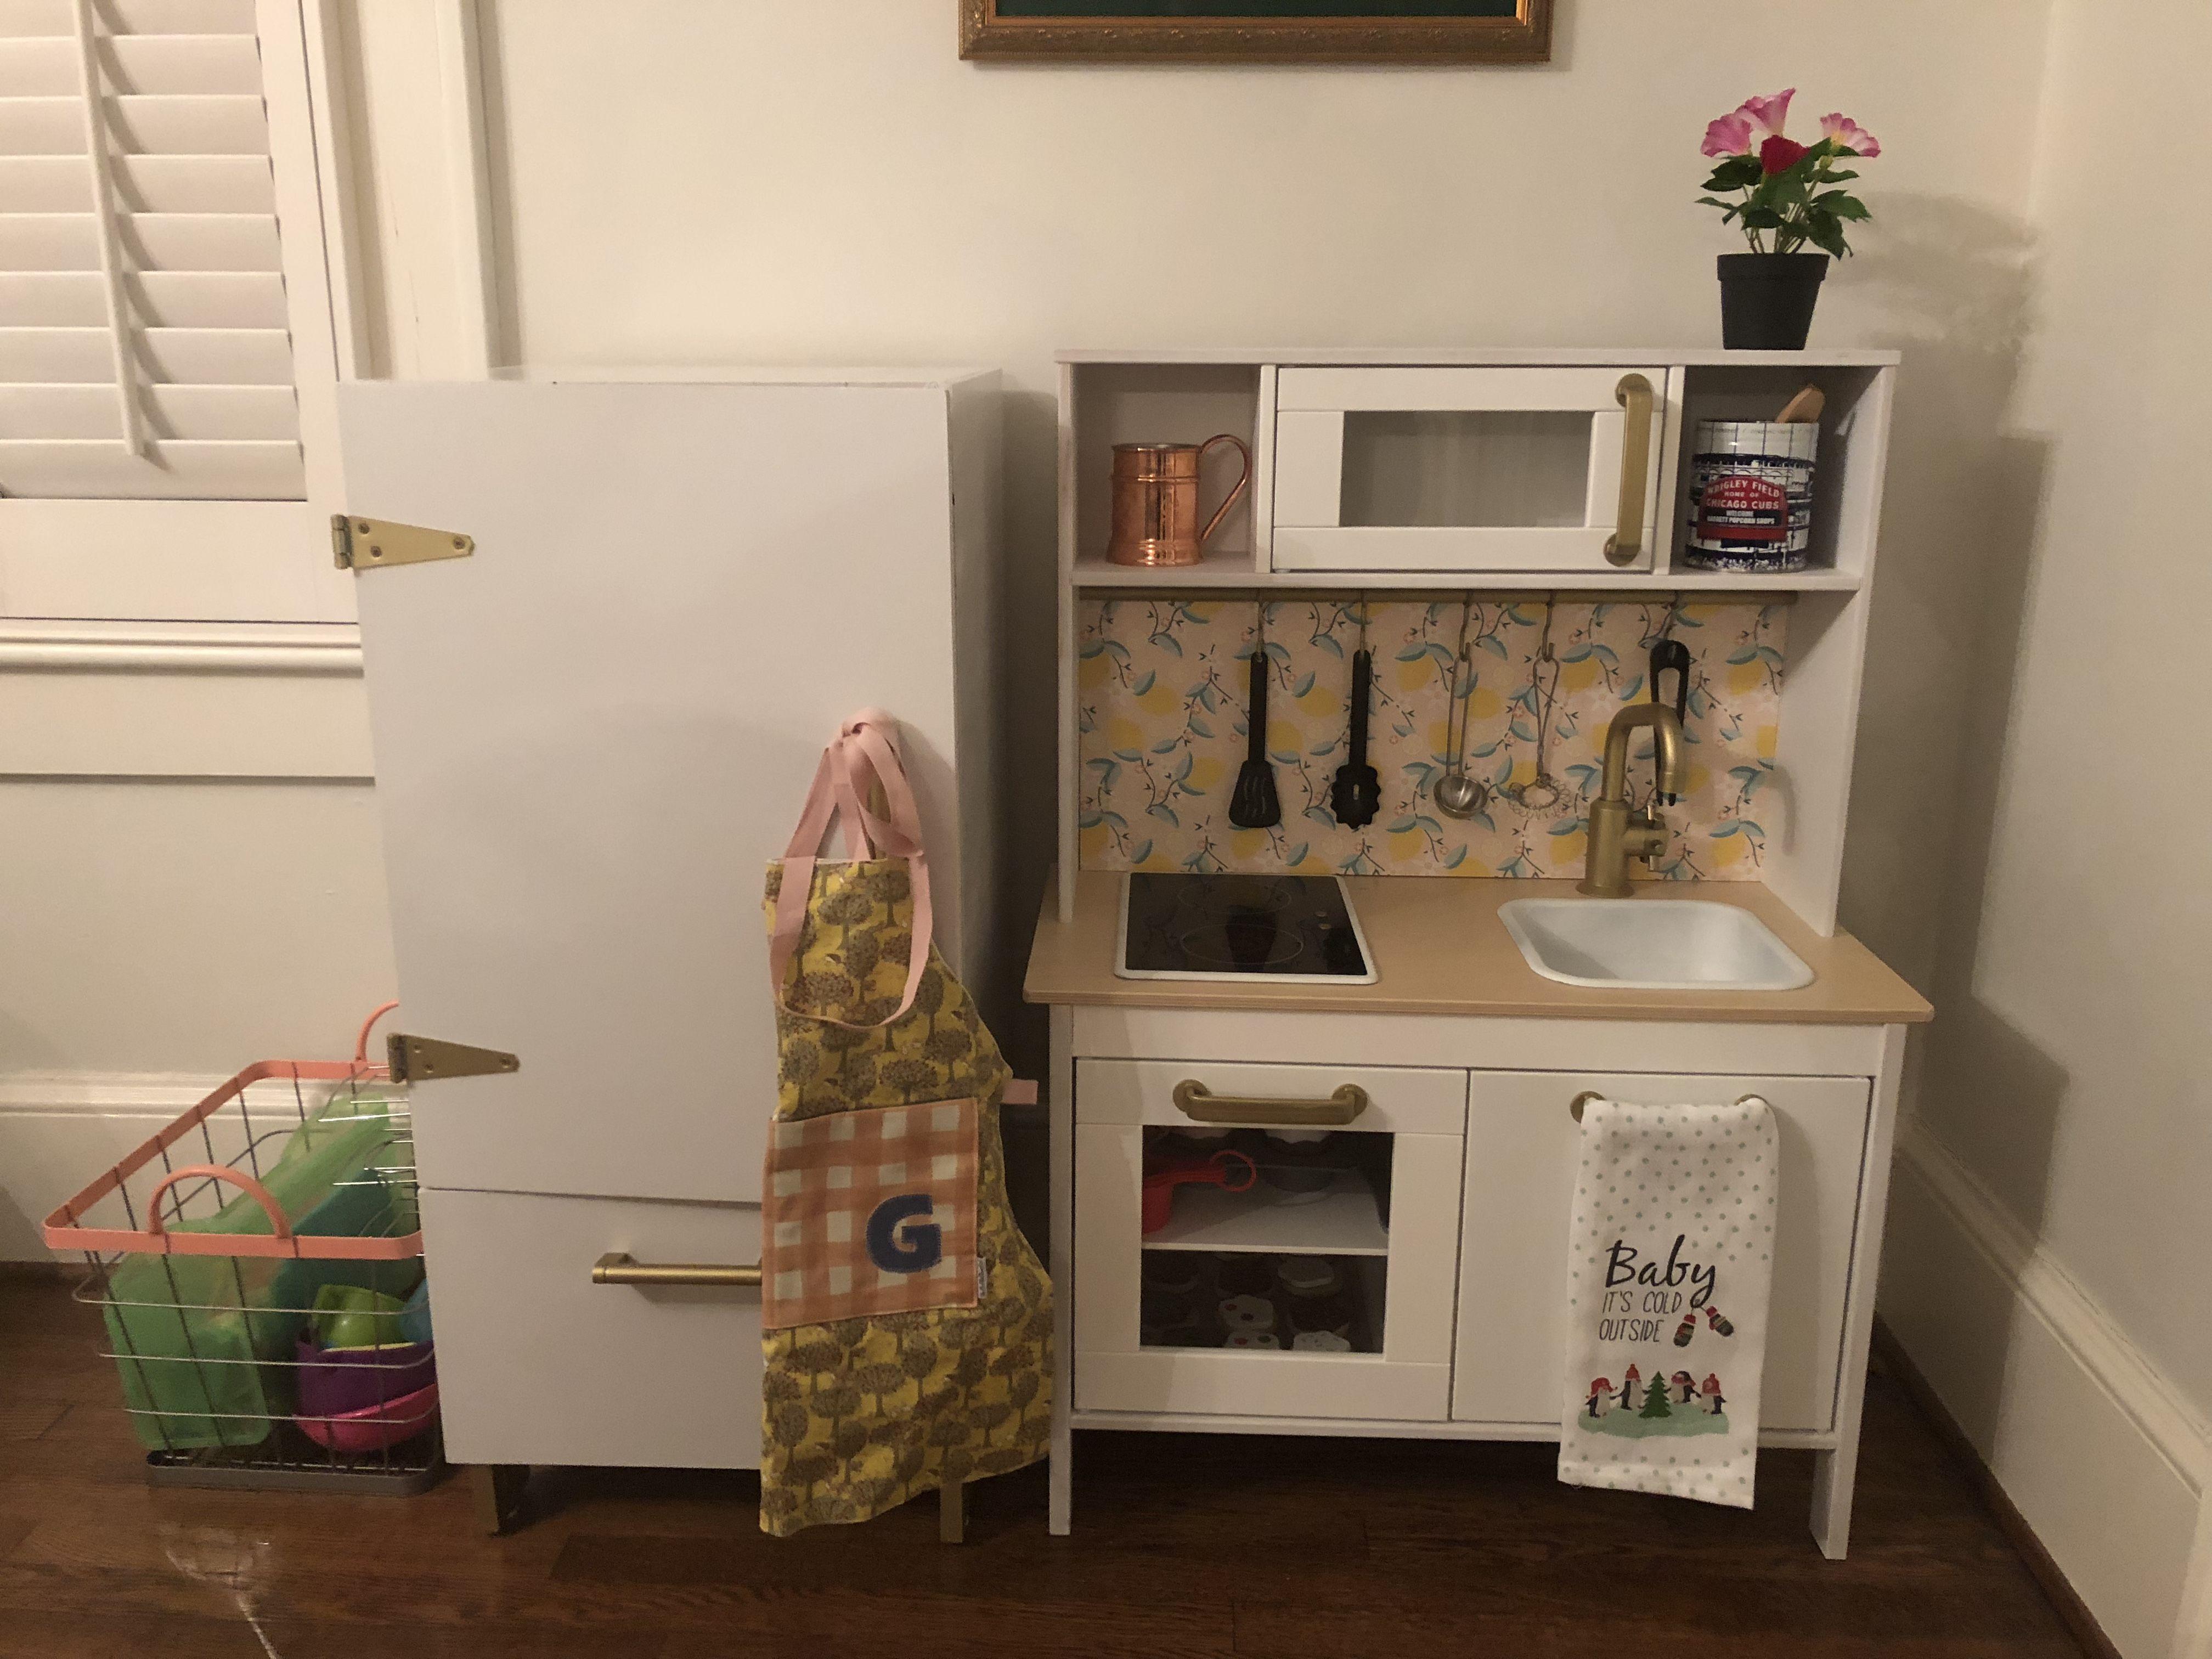 Ikea Duktig Hack. Fridge for Ikea Duktig. Play fridge